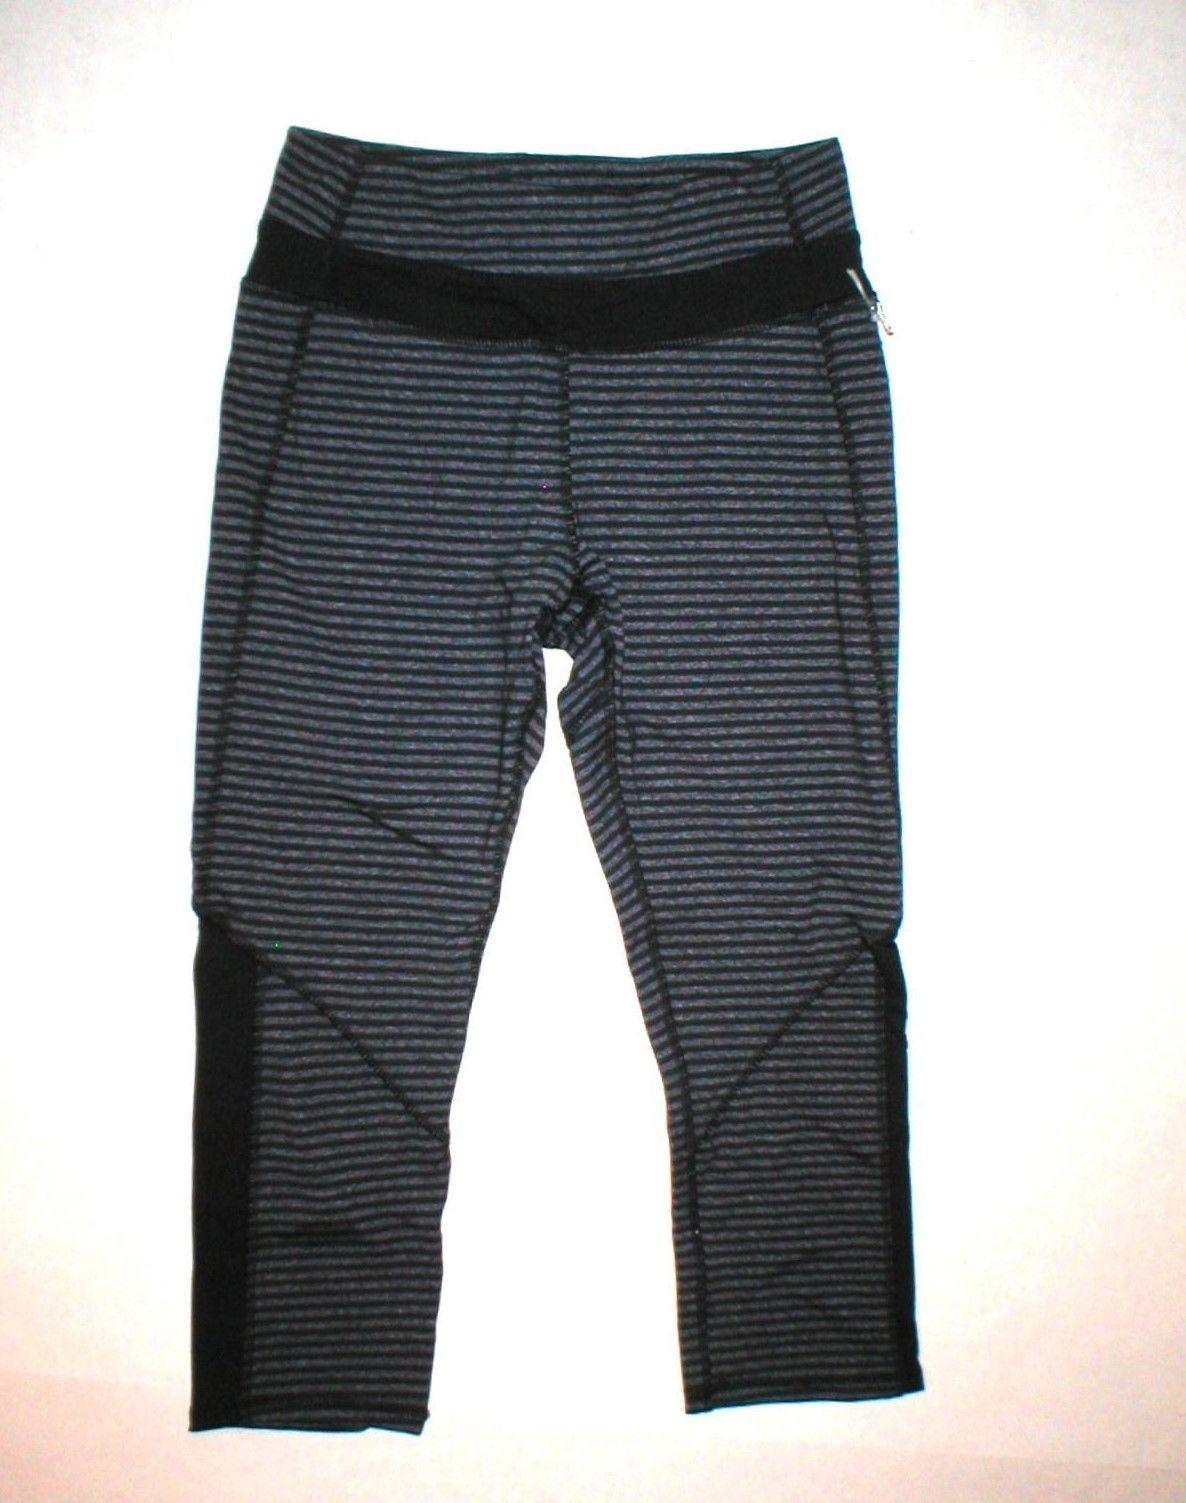 854e12e66a NWT Women s KYODAN Cropped Capri Running Yoga Fitness Workout Pant Gray Size  XS